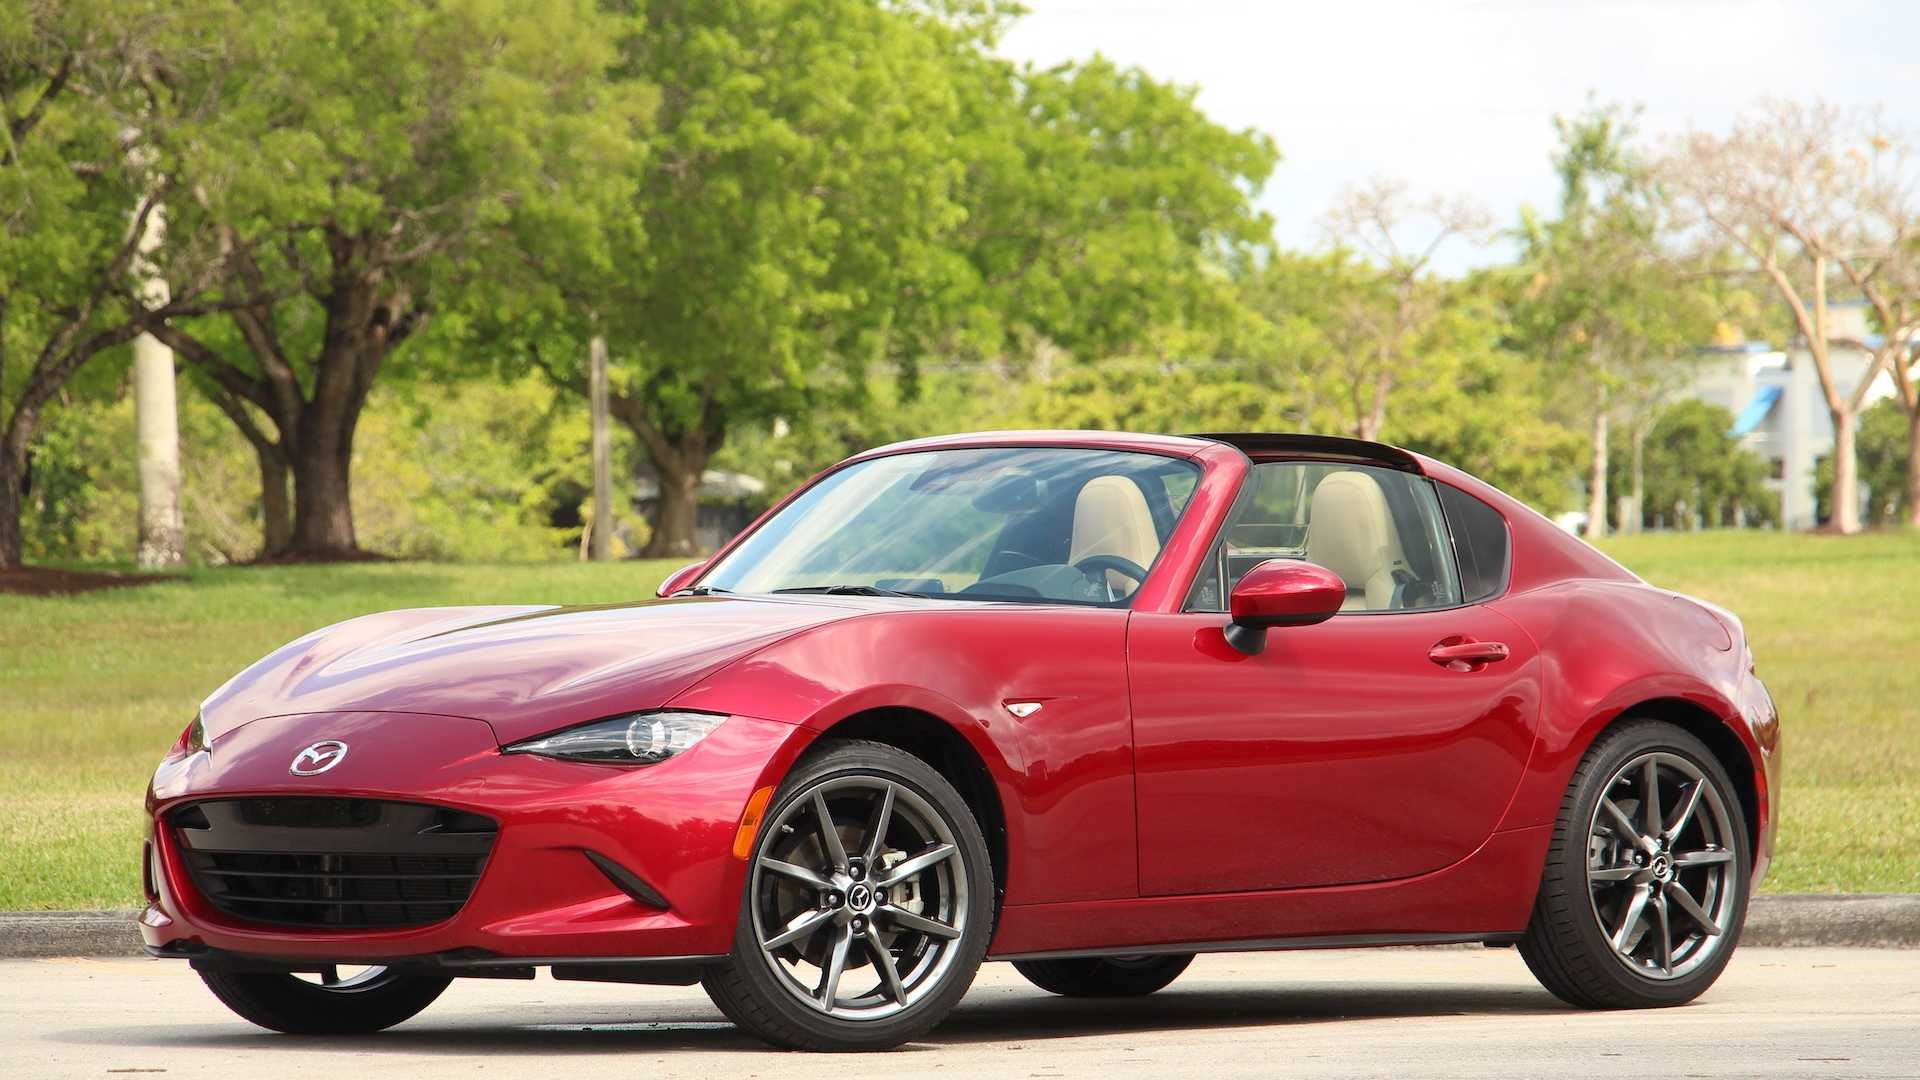 2020 Mazda Mx 5 Miata New Review